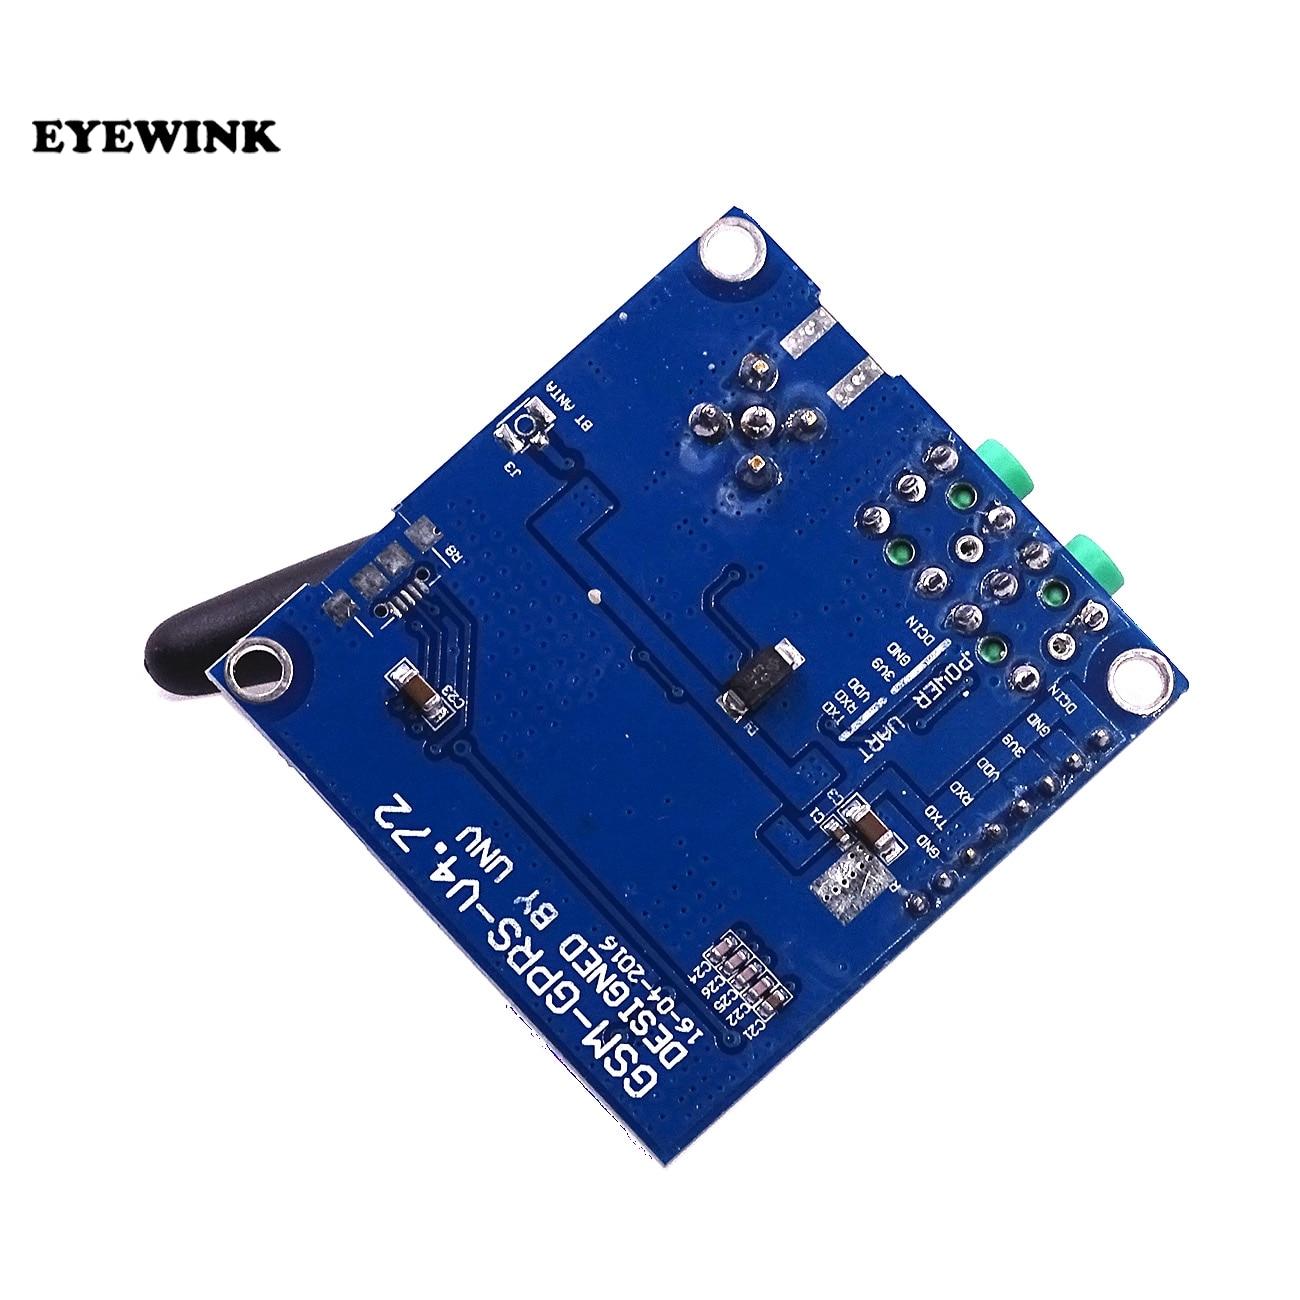 SIM800 MINI V4.0 Wireless Modul GSM GPRS STM32 Board Kit Antenna V4.0